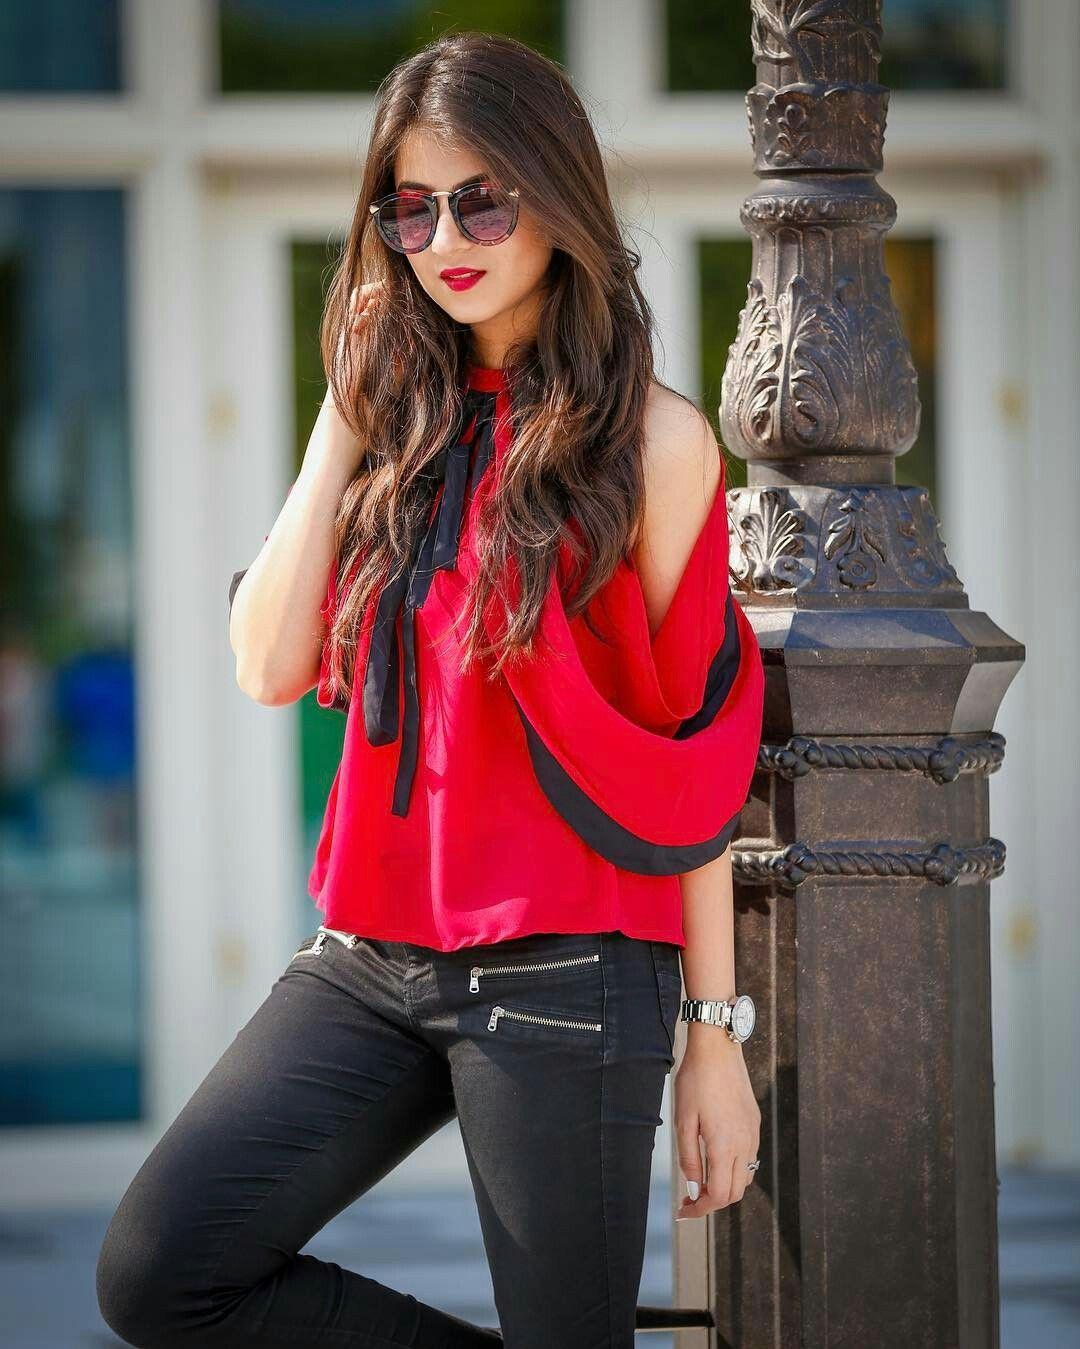 Zara Afreen Khan | GîŔĺś DpZžżźz.. | Pinterest